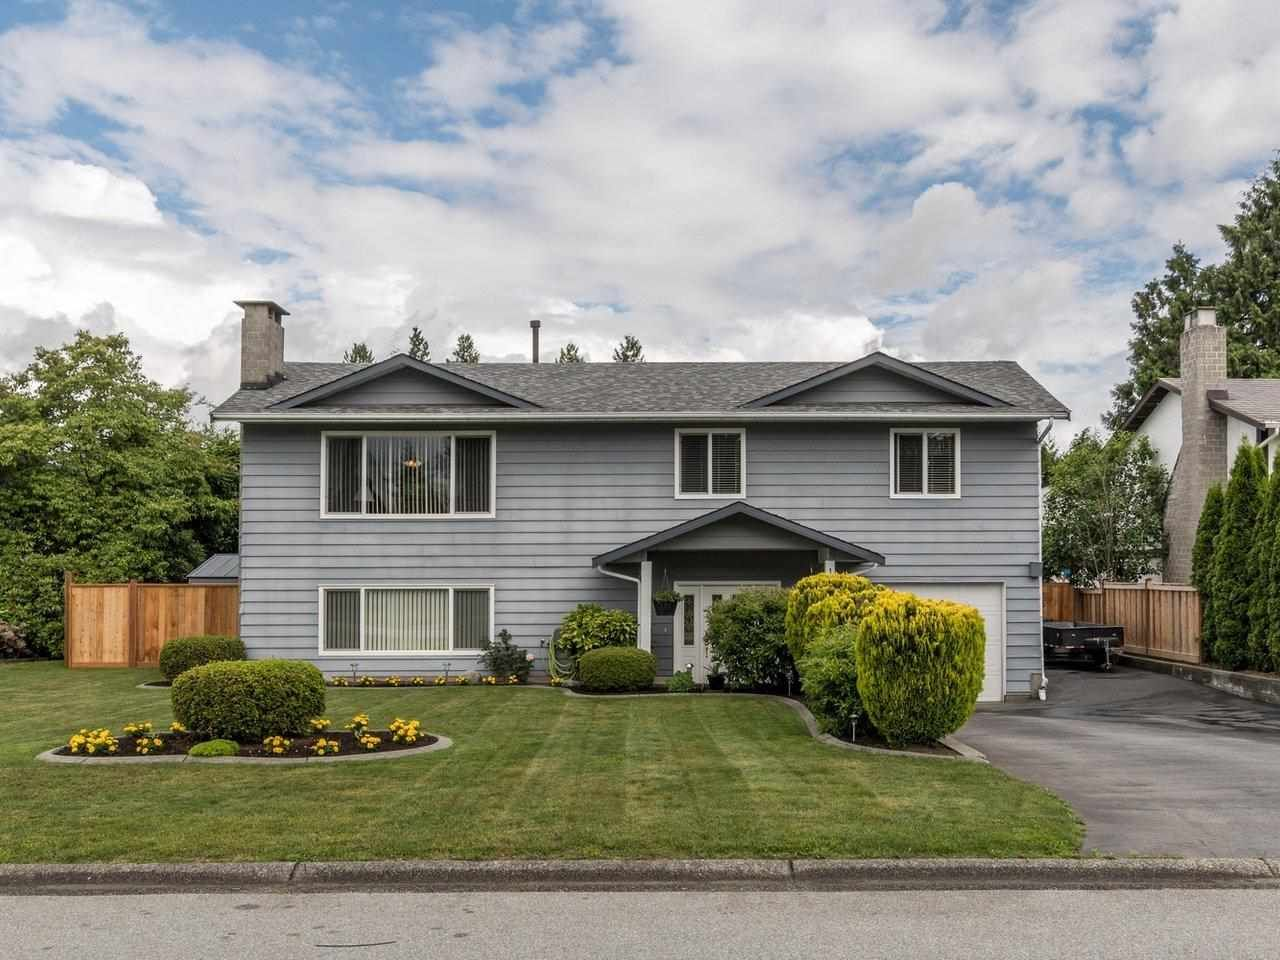 Main Photo: 19349 121A Avenue in Pitt Meadows: Mid Meadows House for sale : MLS®# R2593403